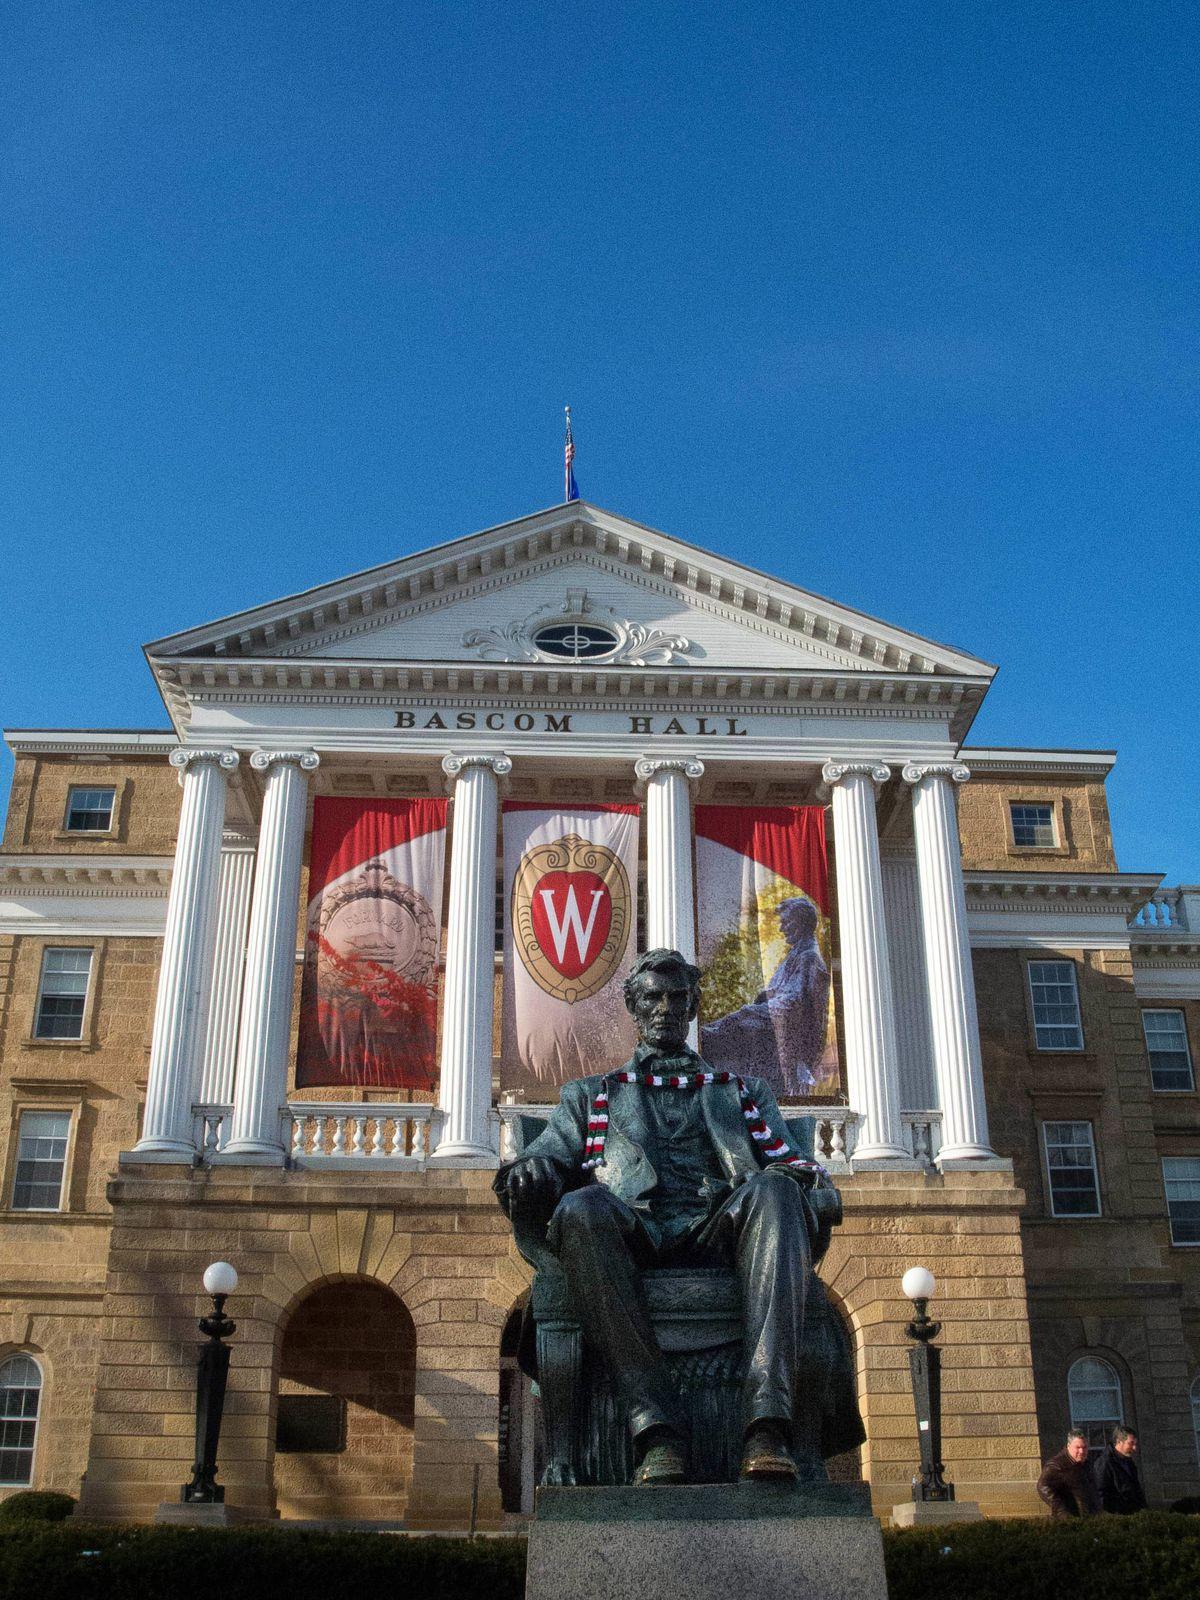 University of Wisconsin, Bascom Hall, Madison, Wisconsin